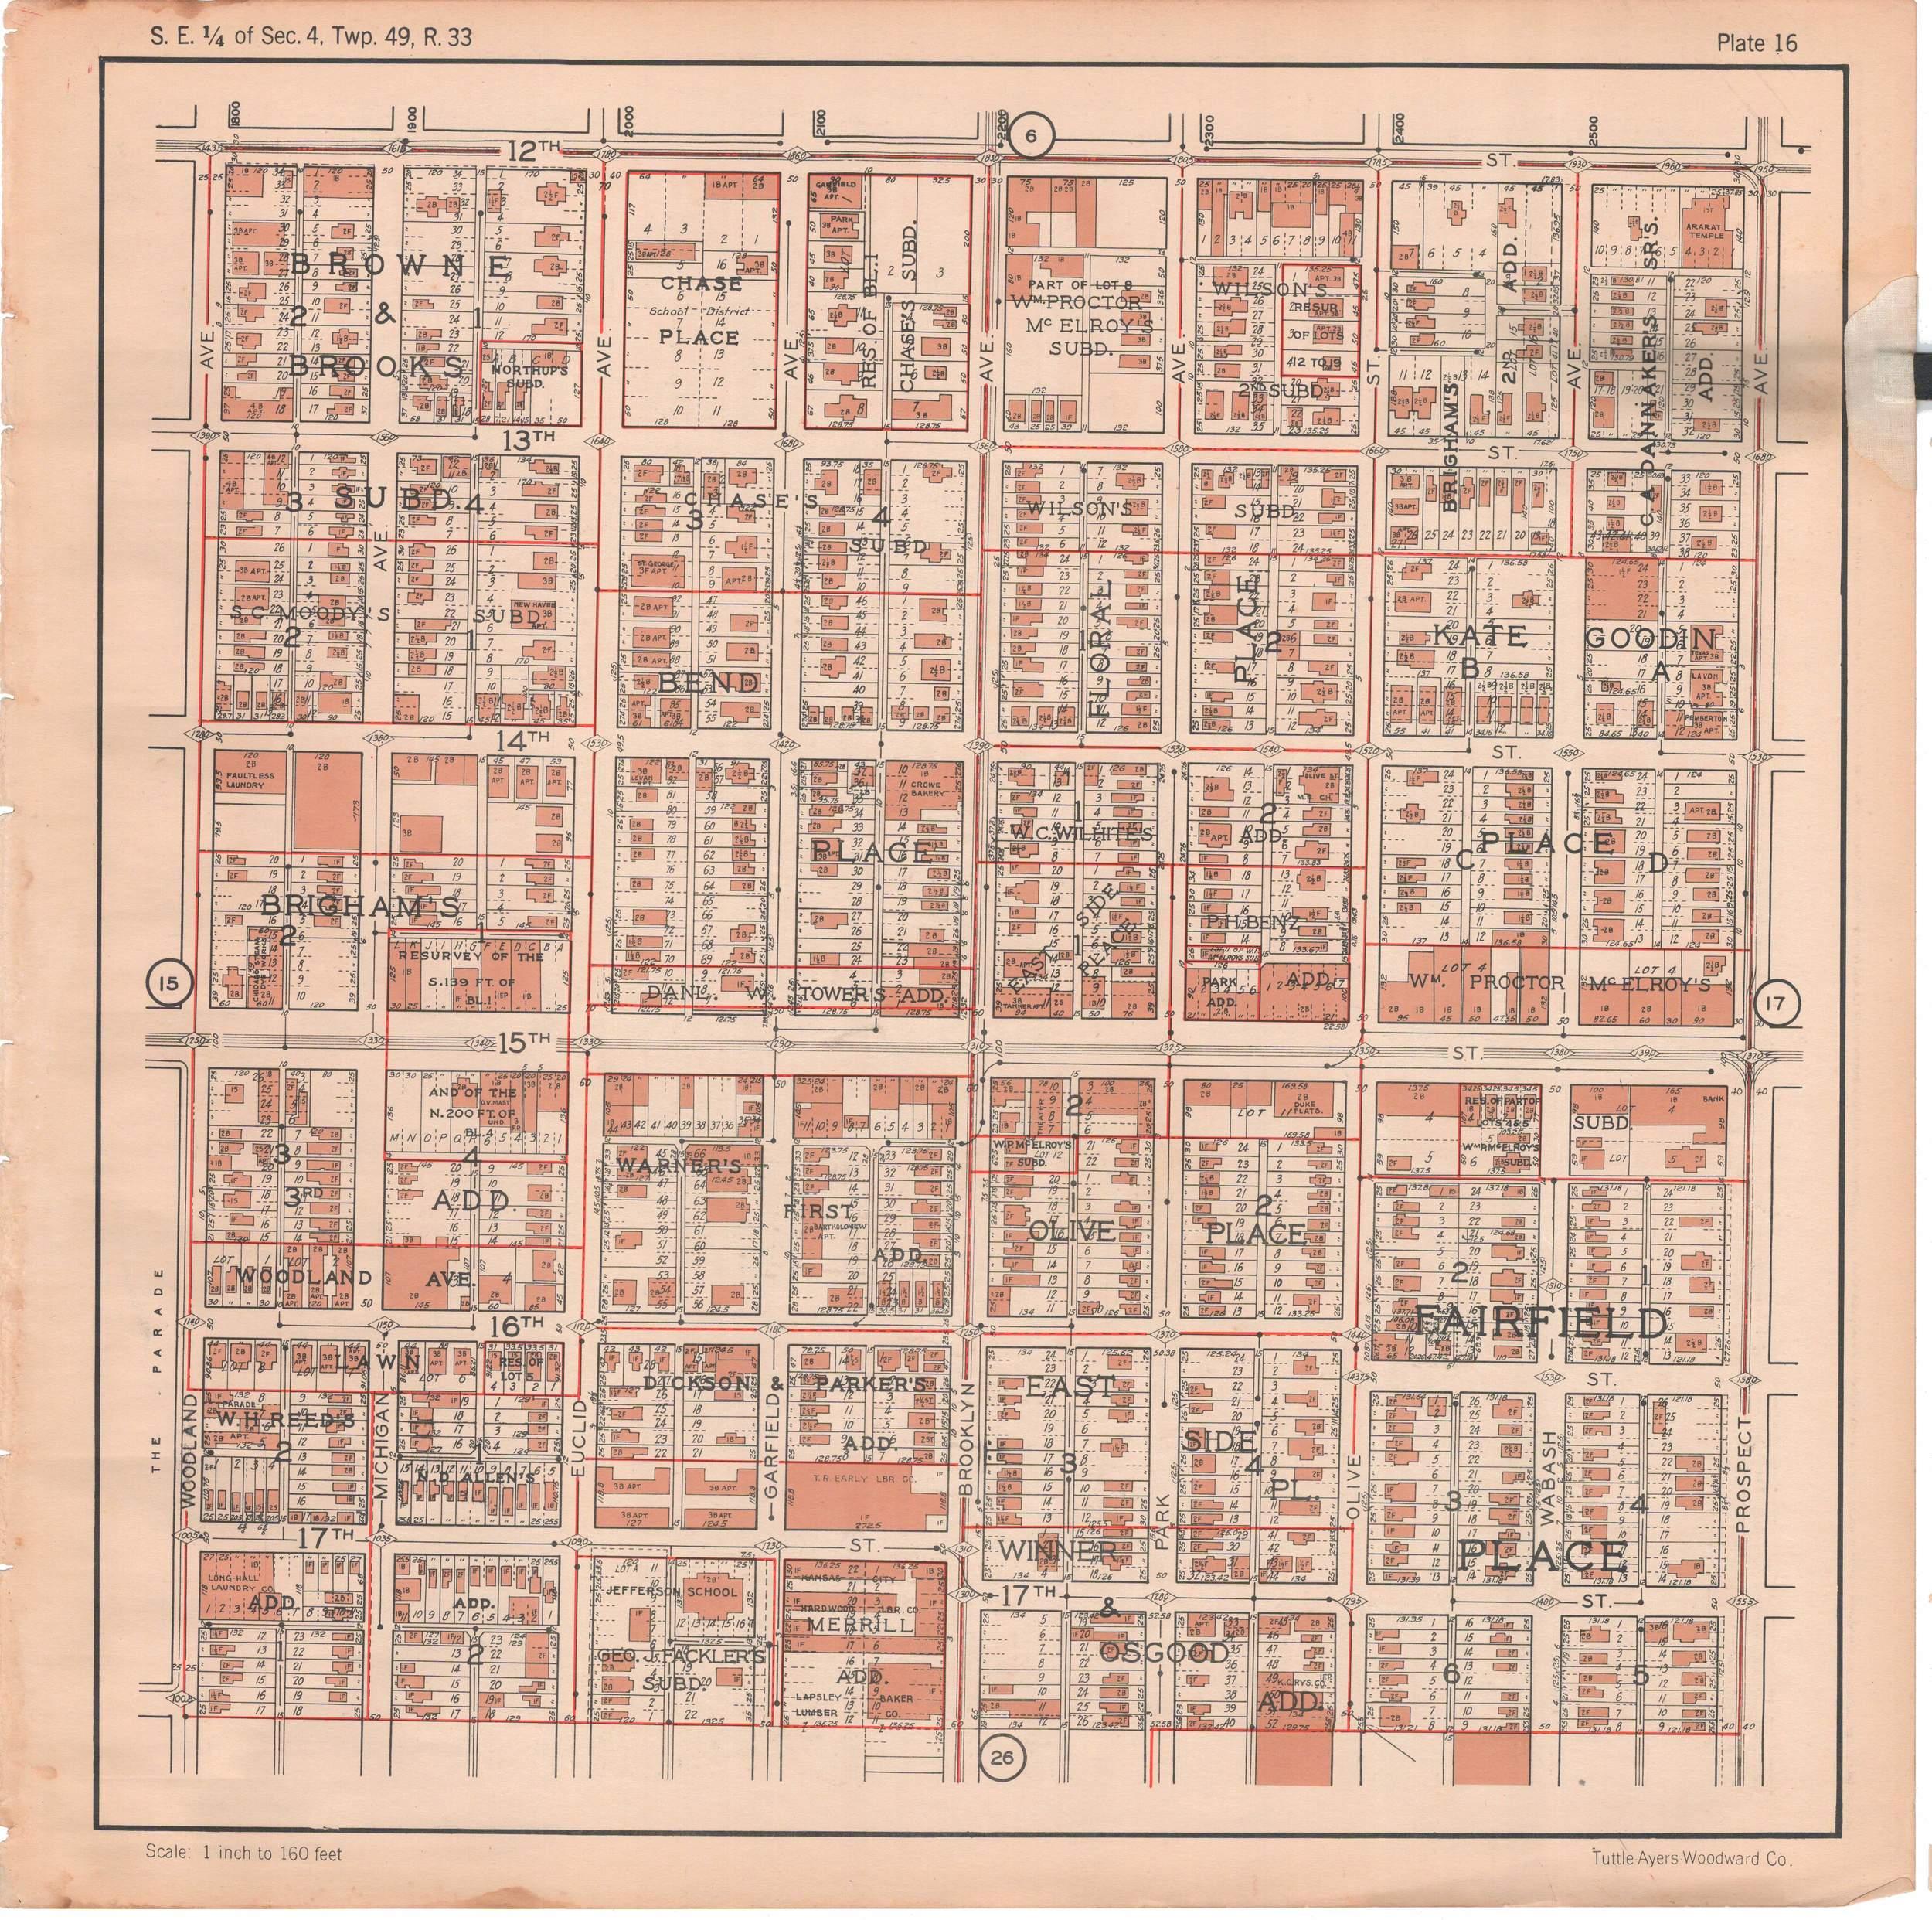 1925 TUTTLE_AYERS_Plate 16.JPG